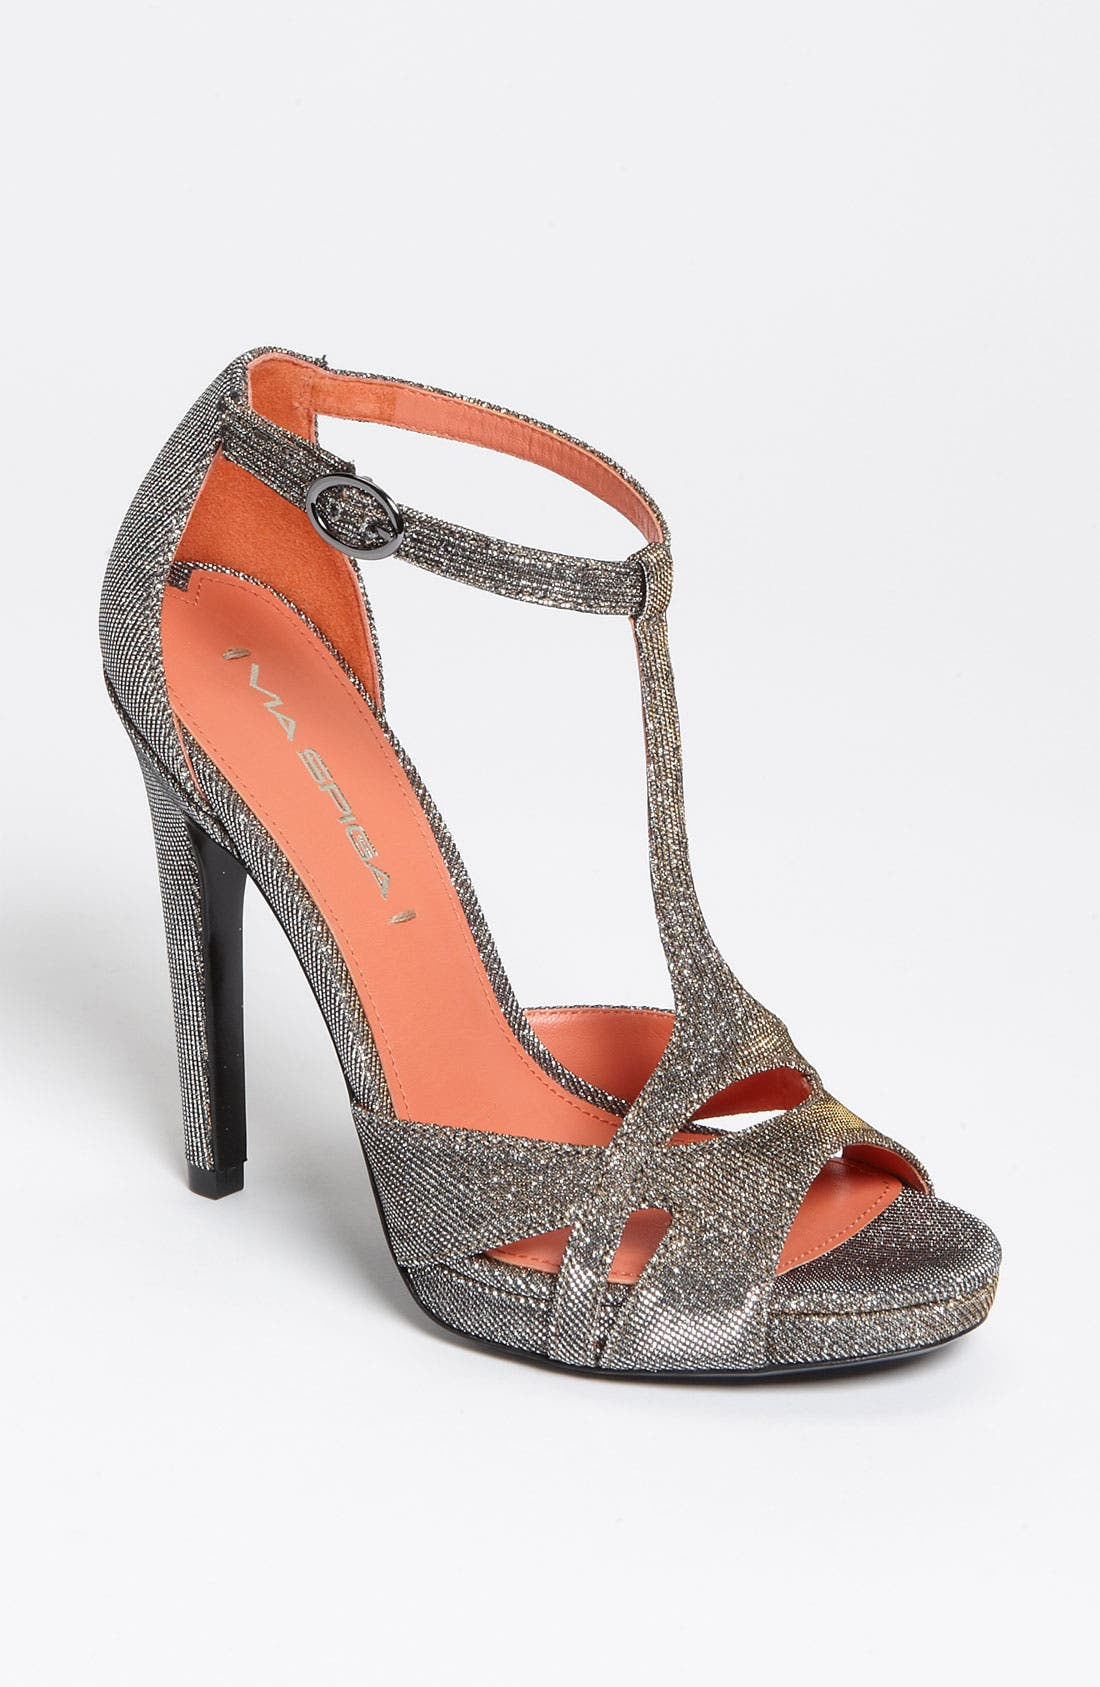 VIA SPIGA 'Pamela' Sandal, Main, color, 040